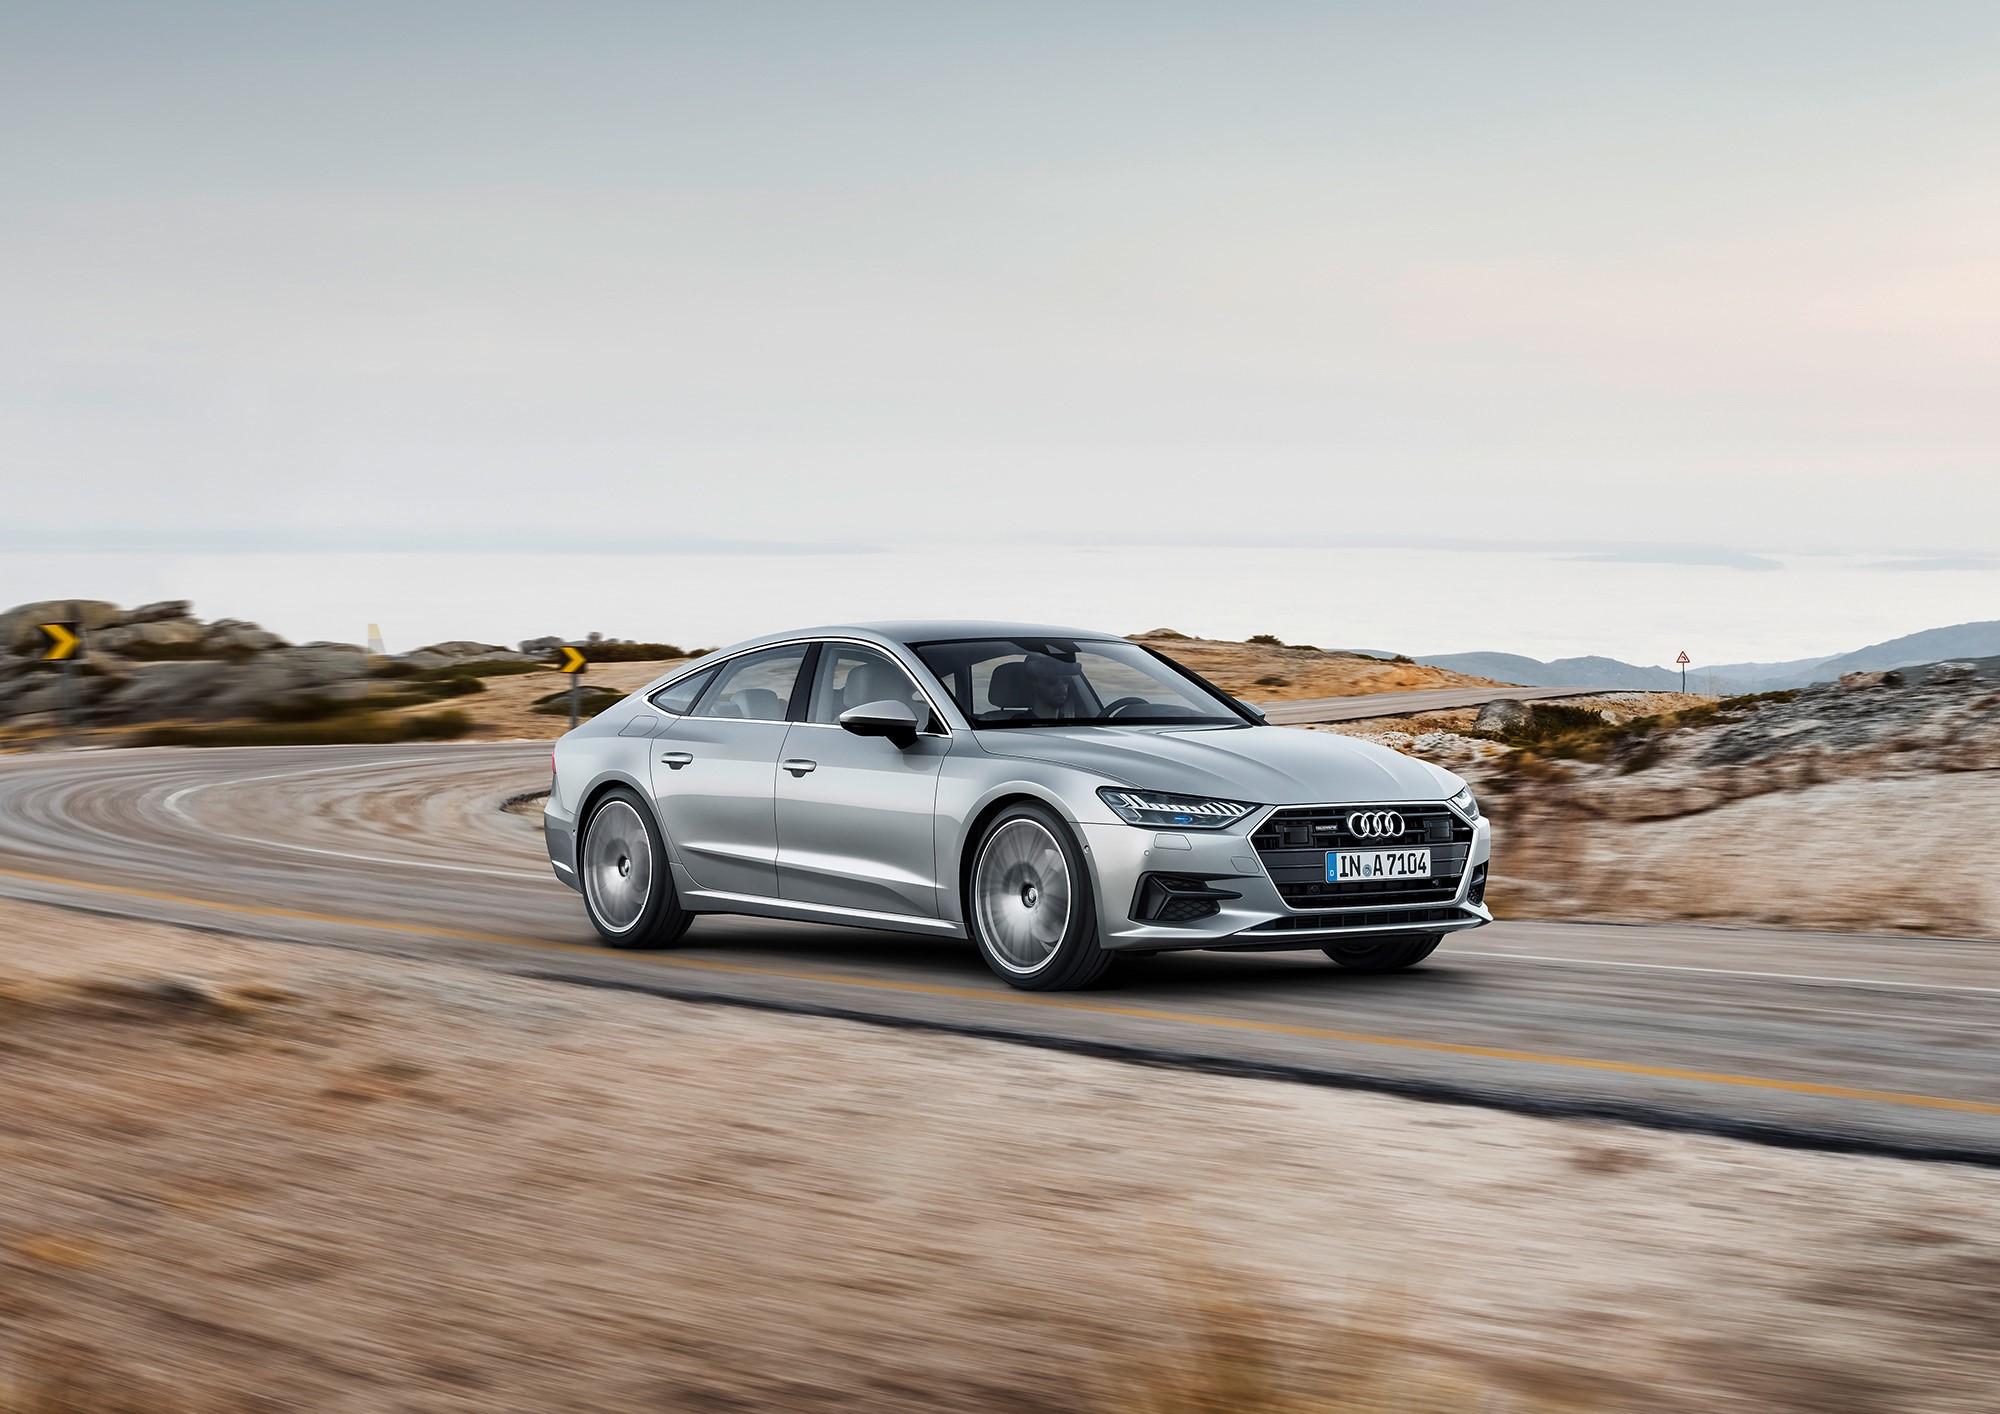 Audi A7 Windows Wallpapers